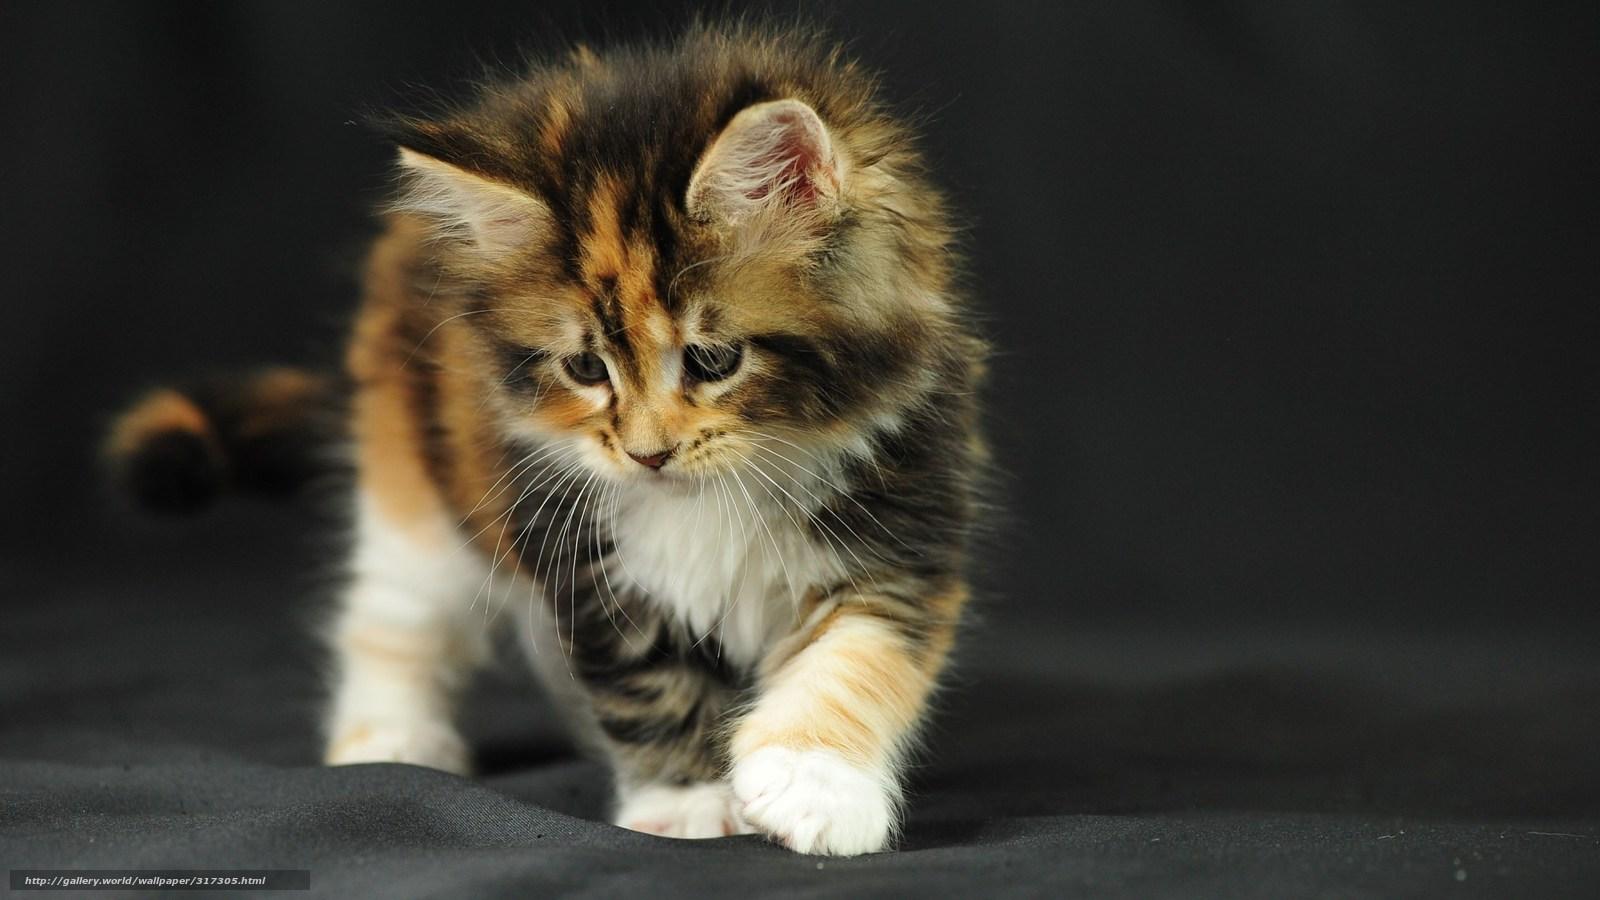 Tlcharger fond d 39 ecran chaton tissu intrt fonds d 39 ecran for Fond ecran gratuit animaux